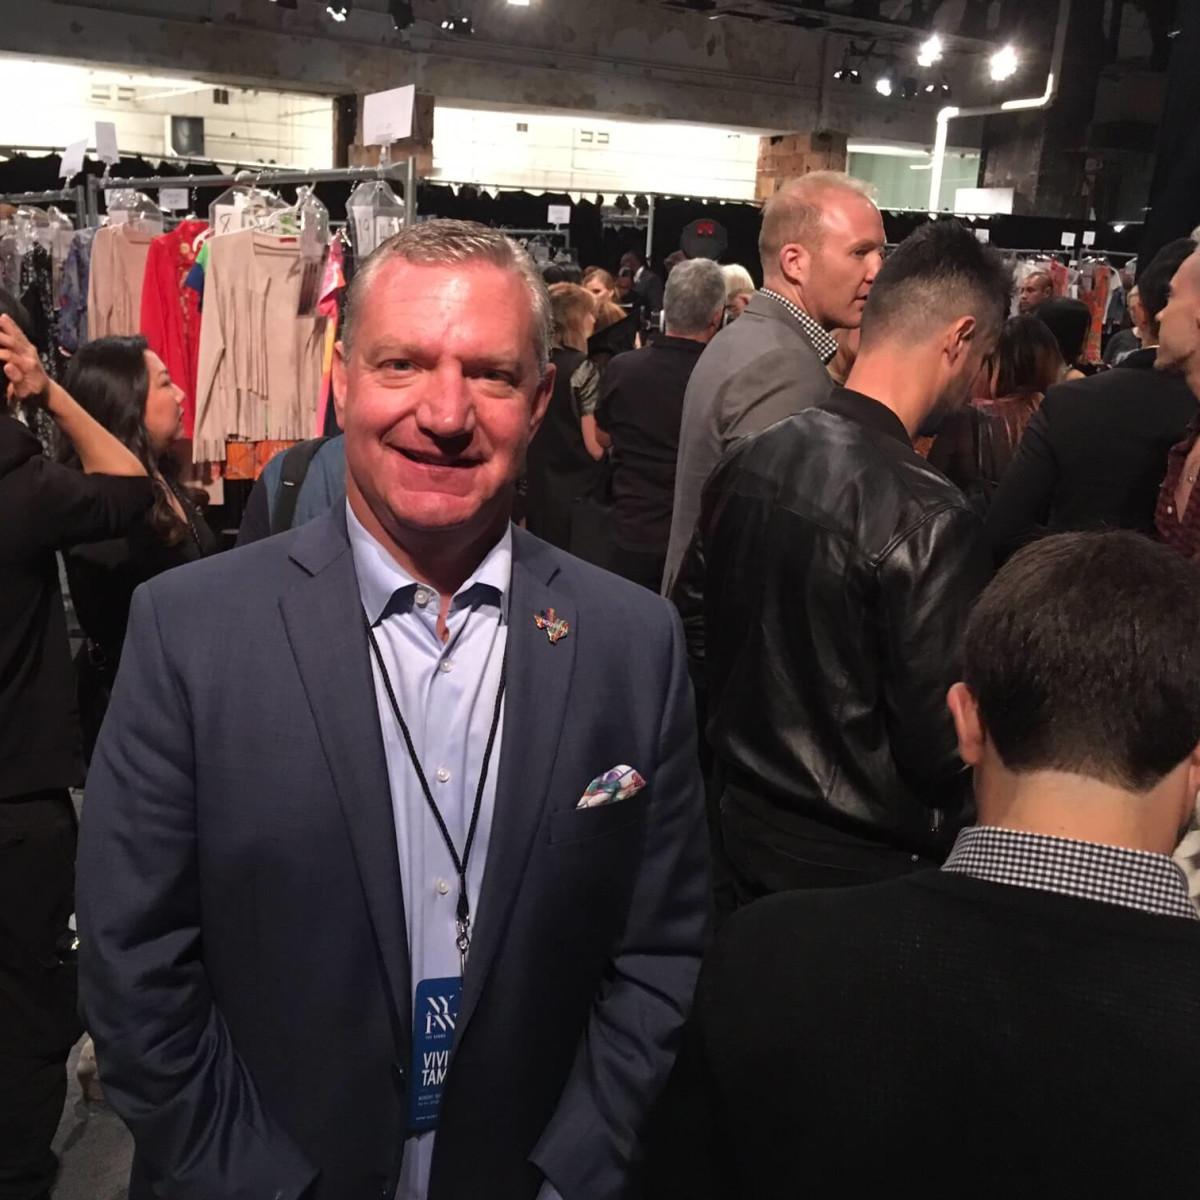 Mike Waterman Visit Houston CEO at Vivienne Tam show